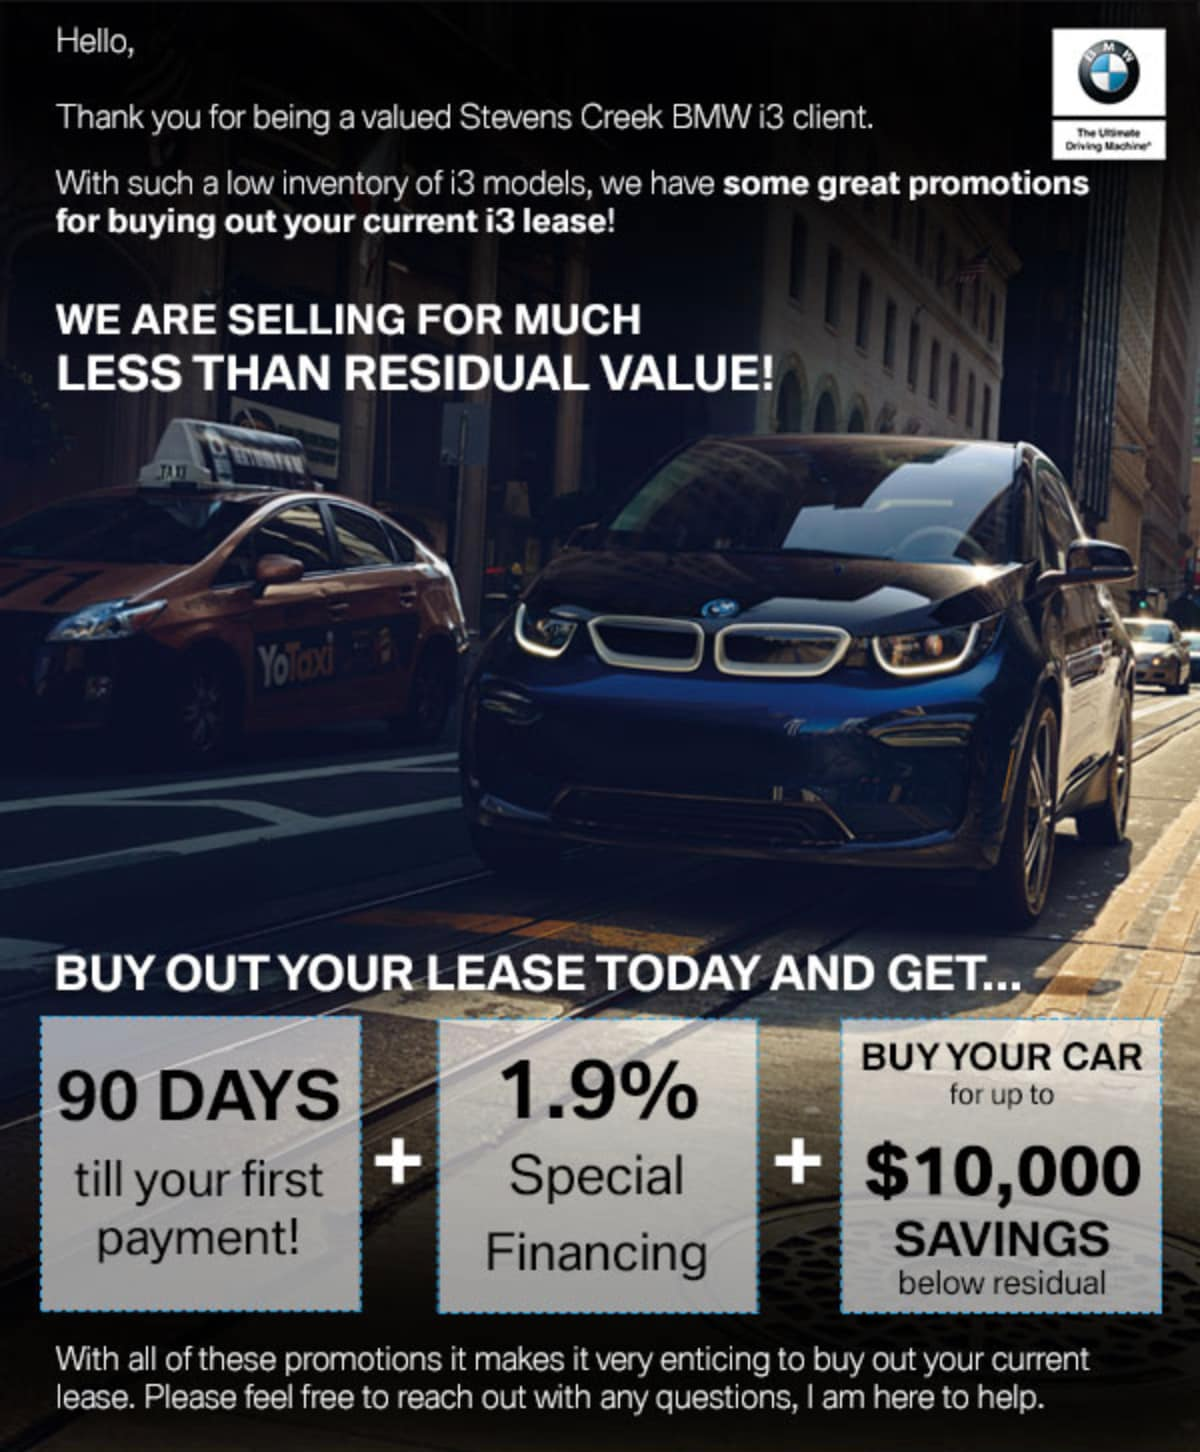 Stevens Creek Bmw Service >> Bmw Lease Buy Out Promotions Stevens Creek Bmw